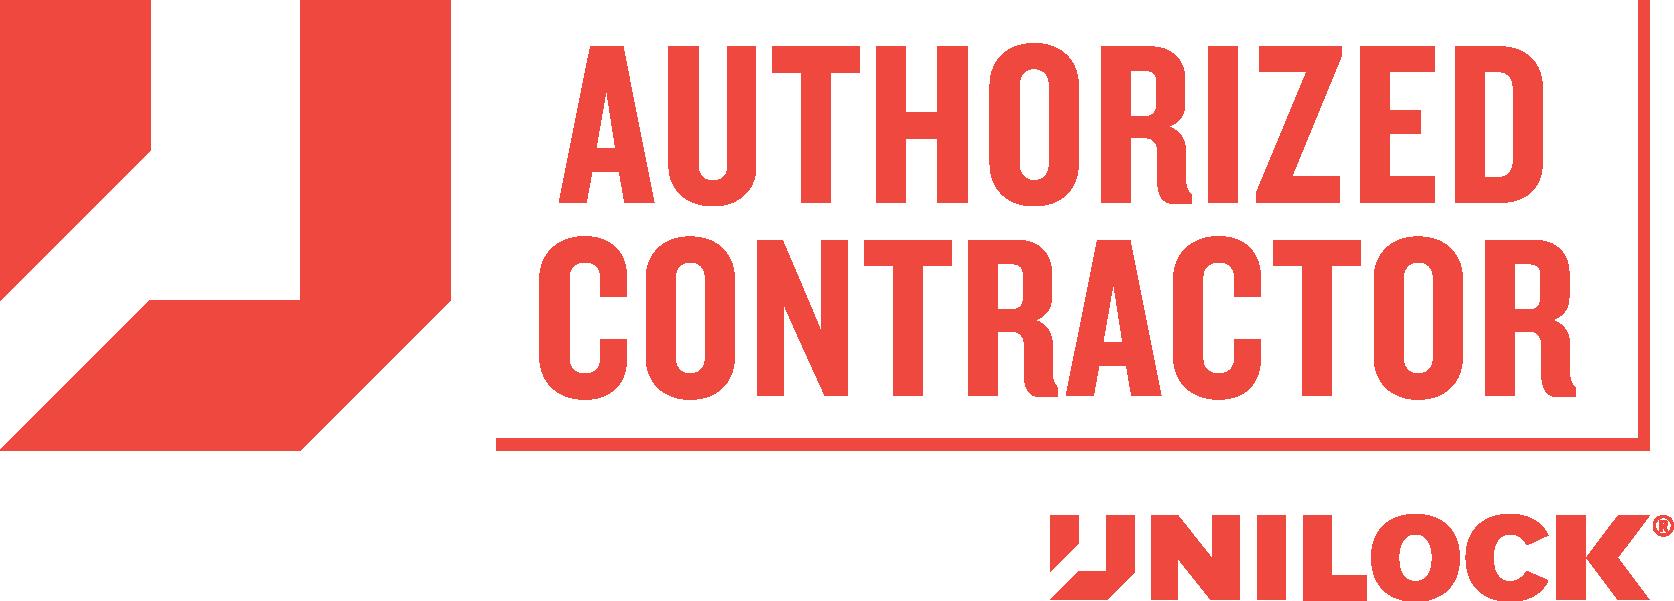 Unilock Authorized Contractor in Ferndale, MI, Metro Detroit